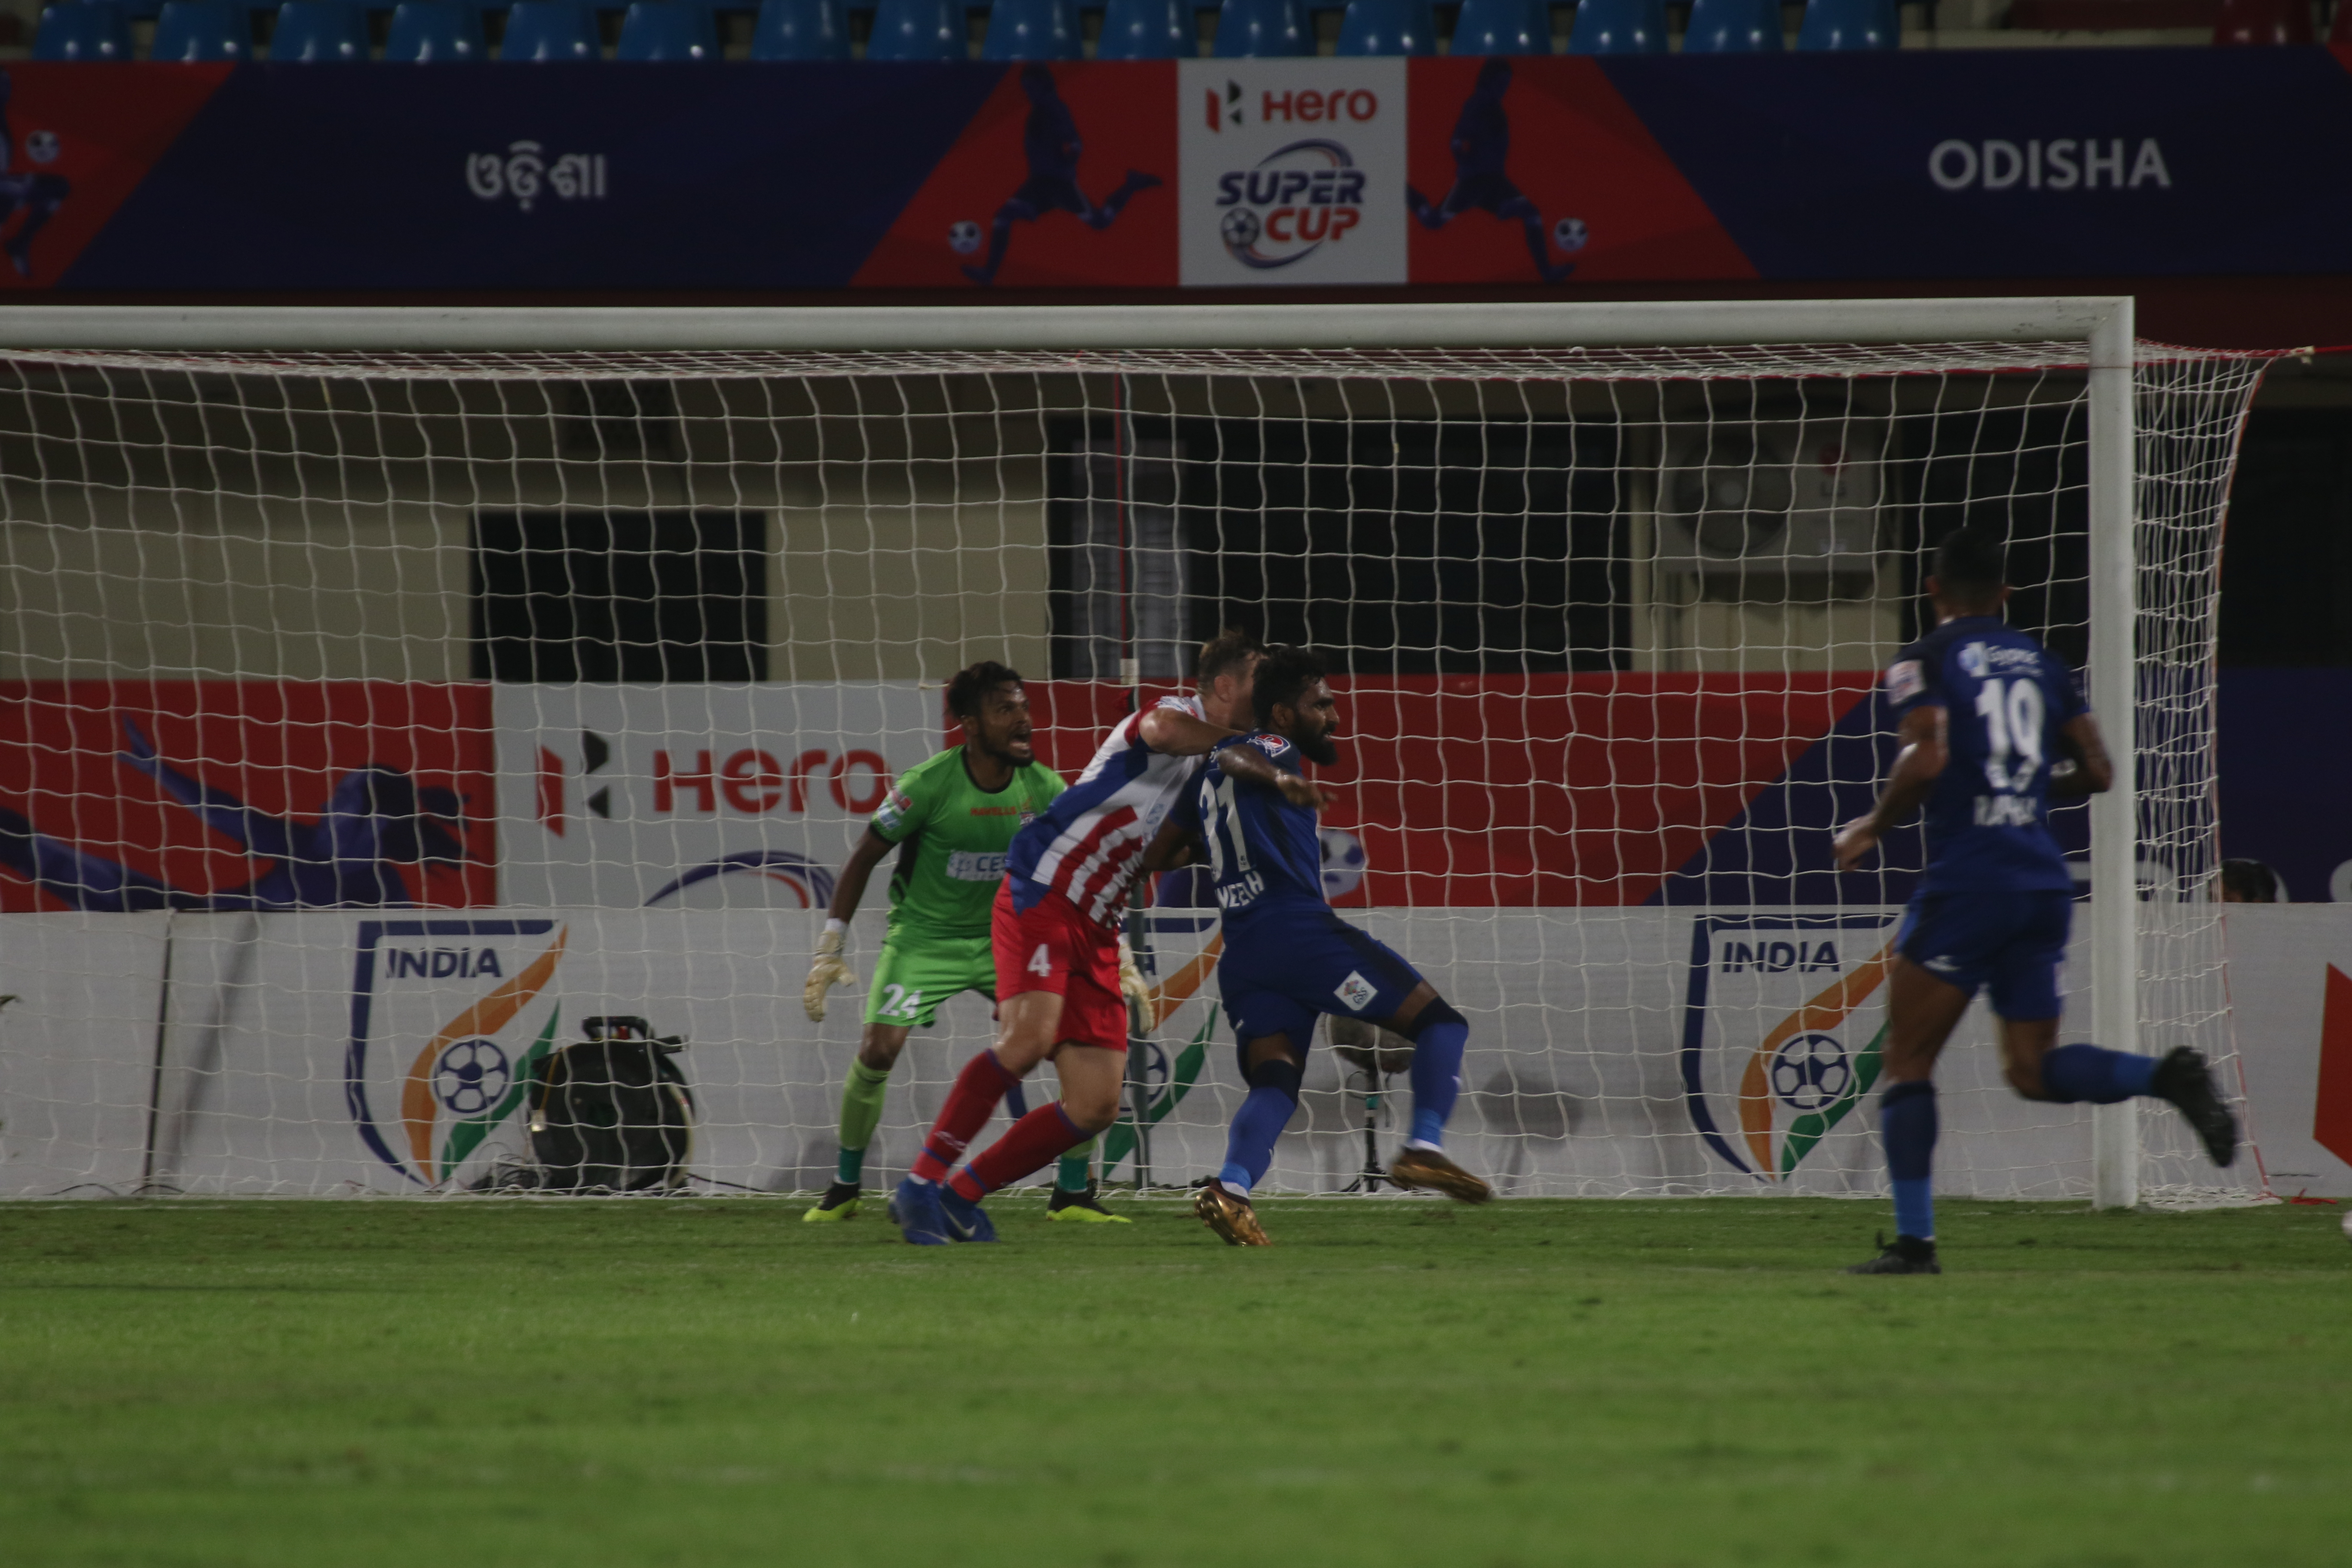 ATK vs Chennaiyin Super Cup 2019